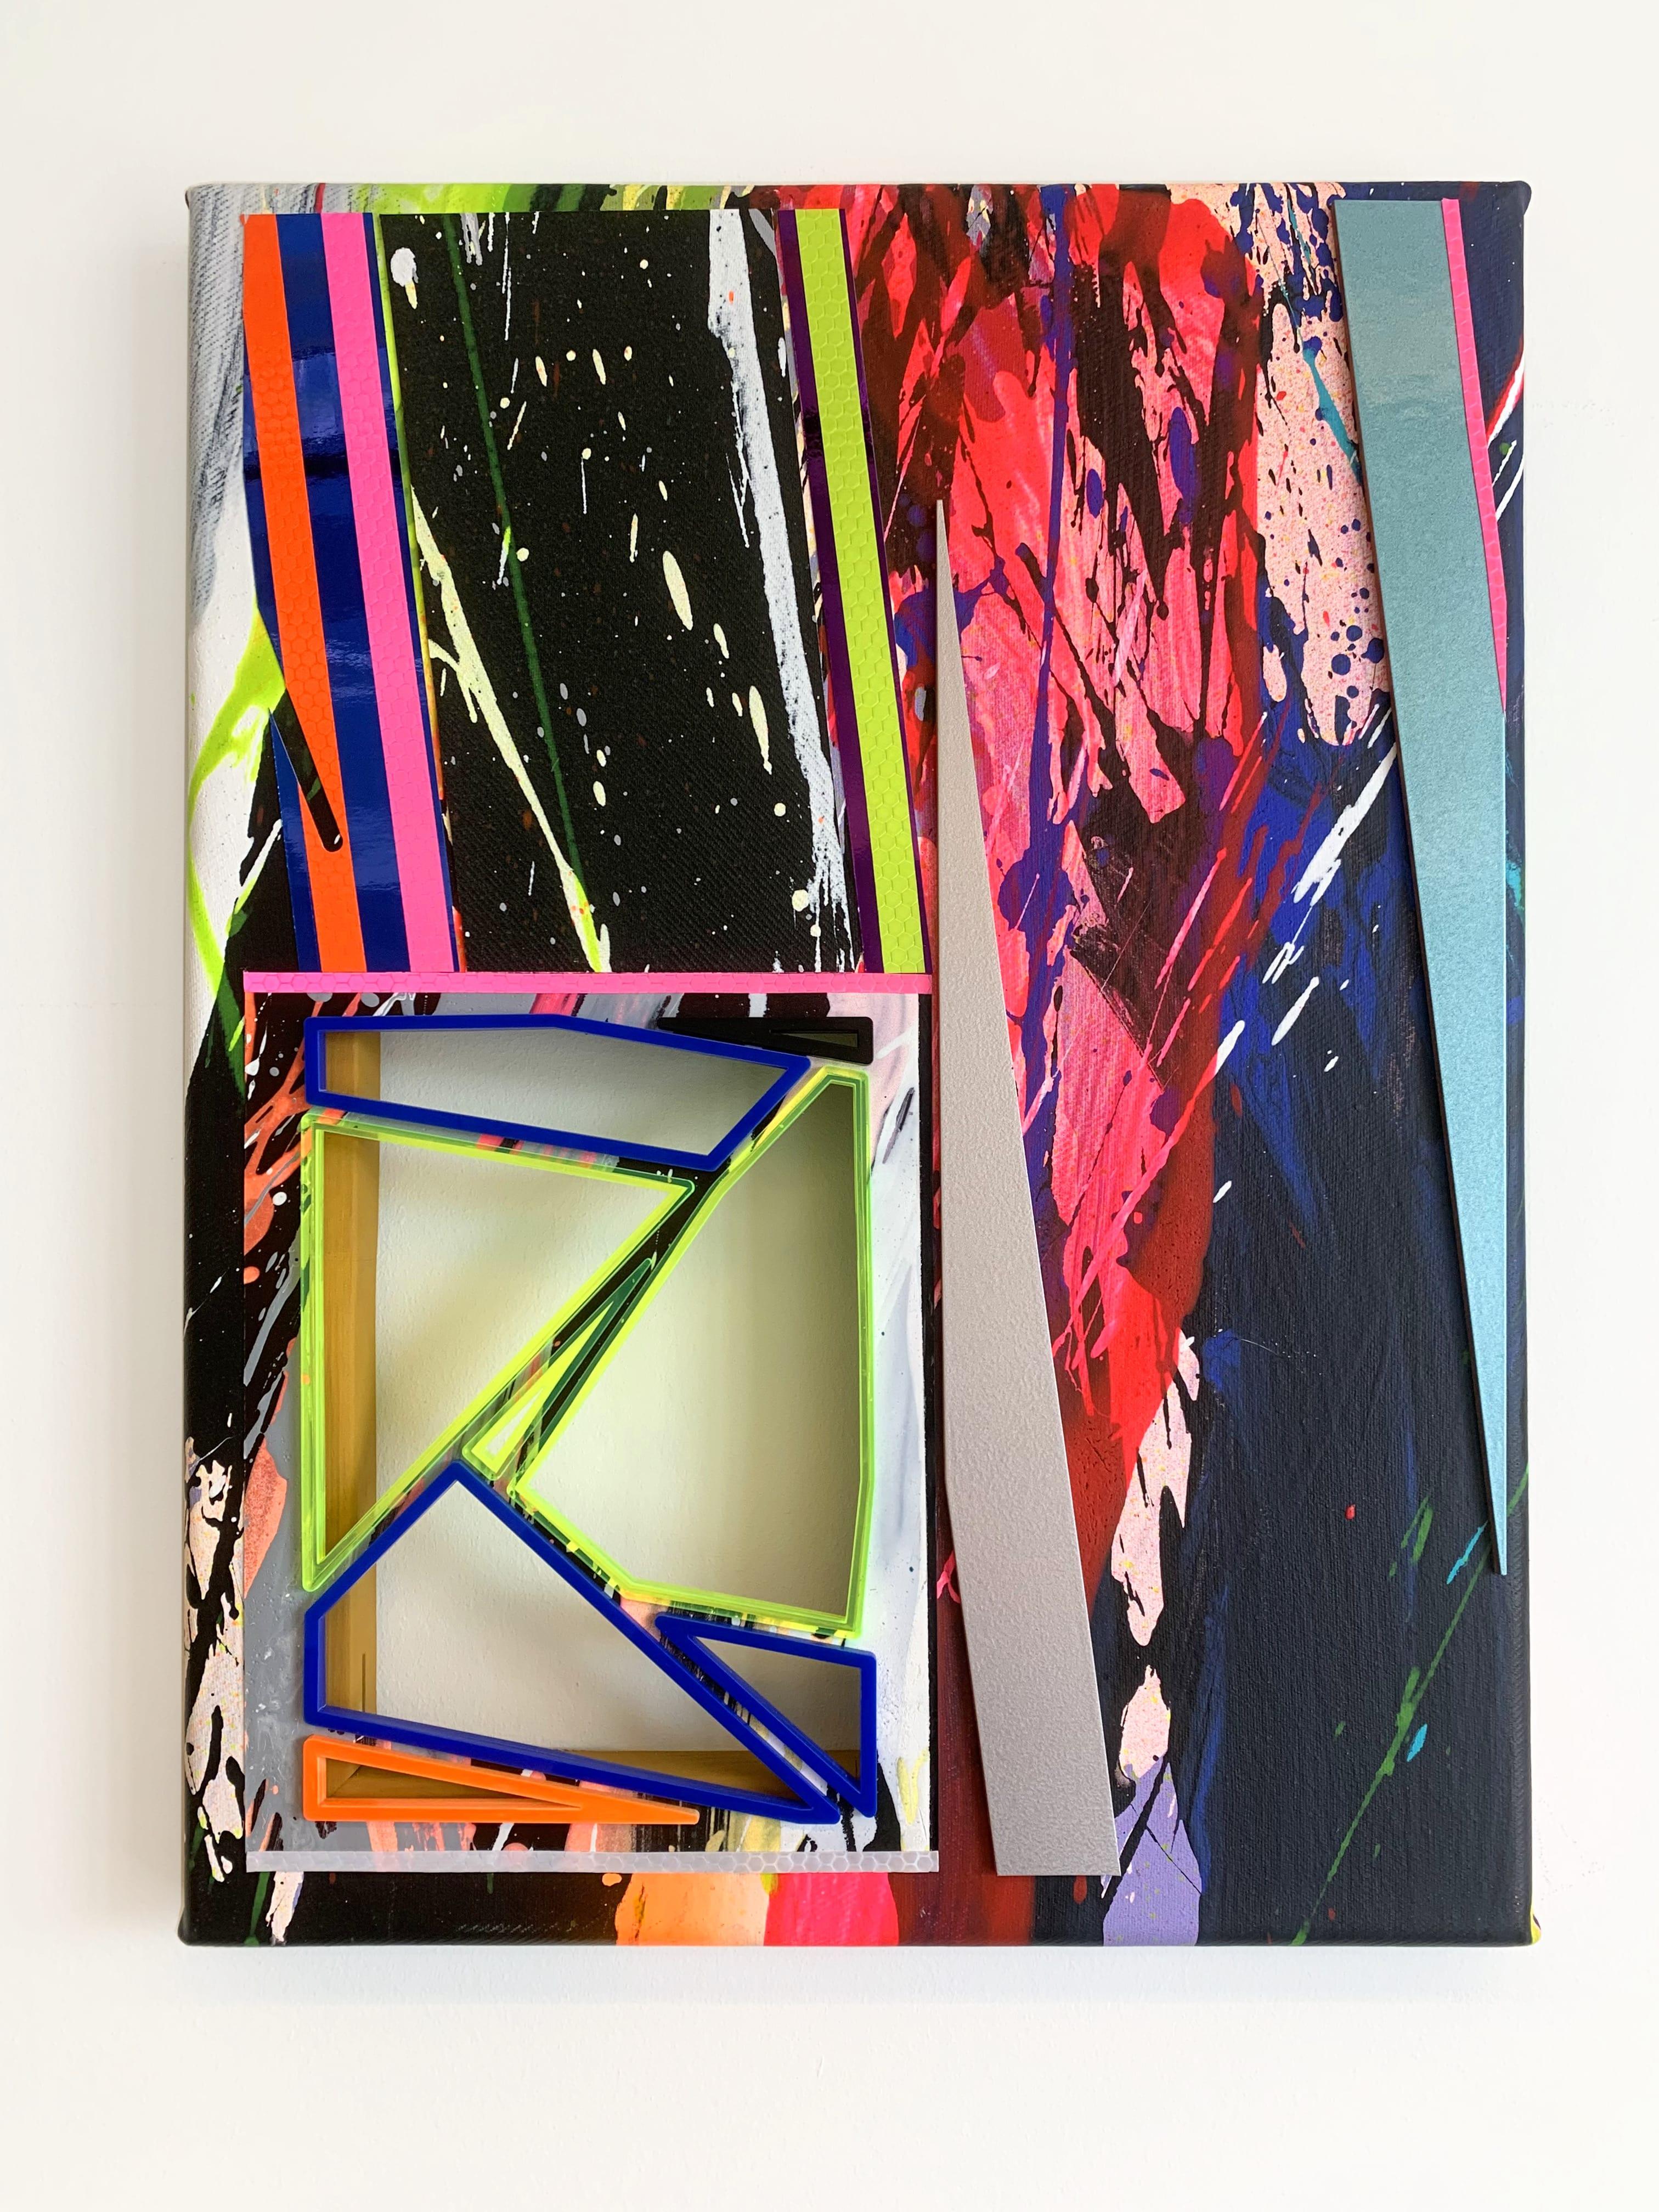 NemesM_FeedForward-01_2020_44x33cm_acrylic-lasercut-perspex-mirror-board-light-reflective-vinyl-carpaint-foamex-PVC-on-canvas-min